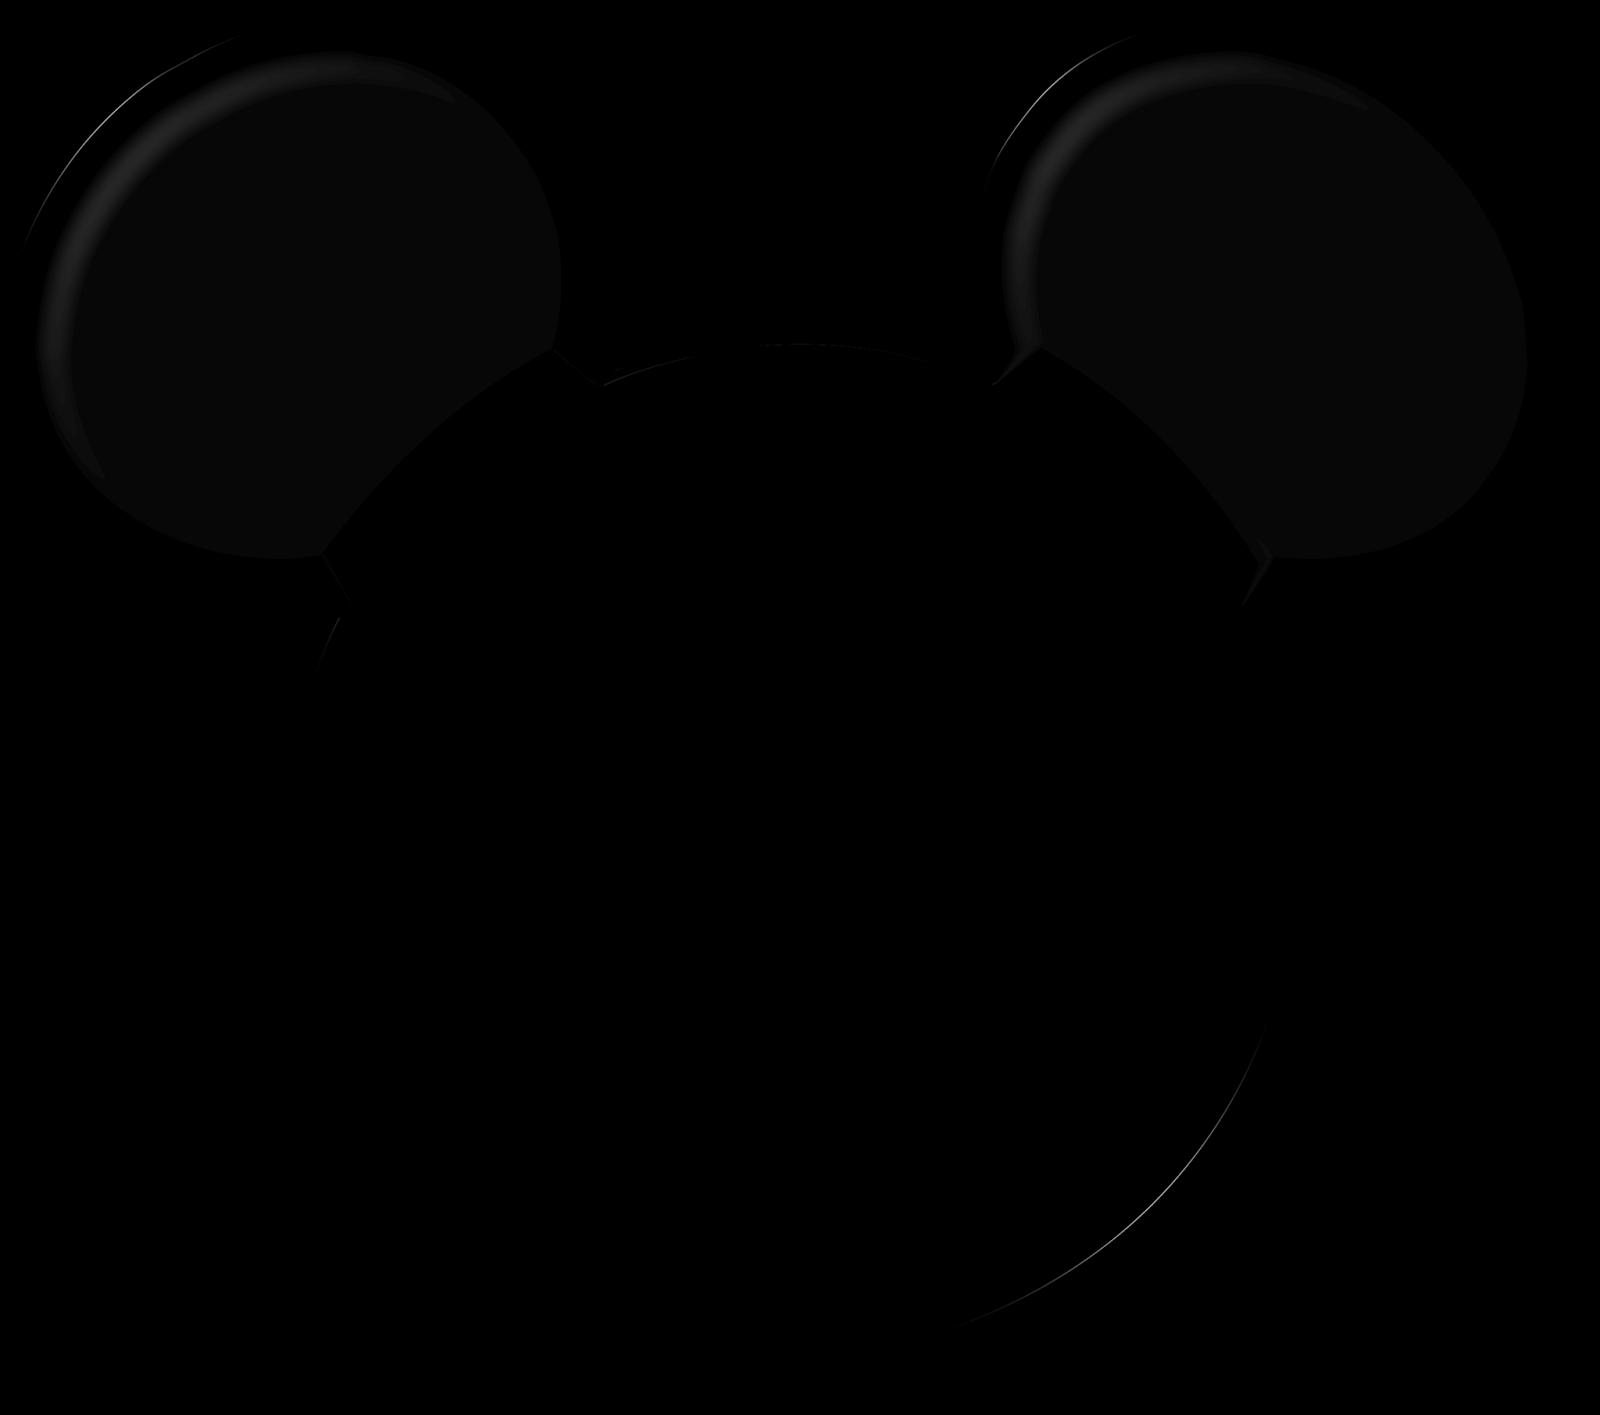 Mickey halloween clipart graphic freeuse download Ghostface Casper Halloween Clip art - Template For Mickey Mouse Ears ... graphic freeuse download